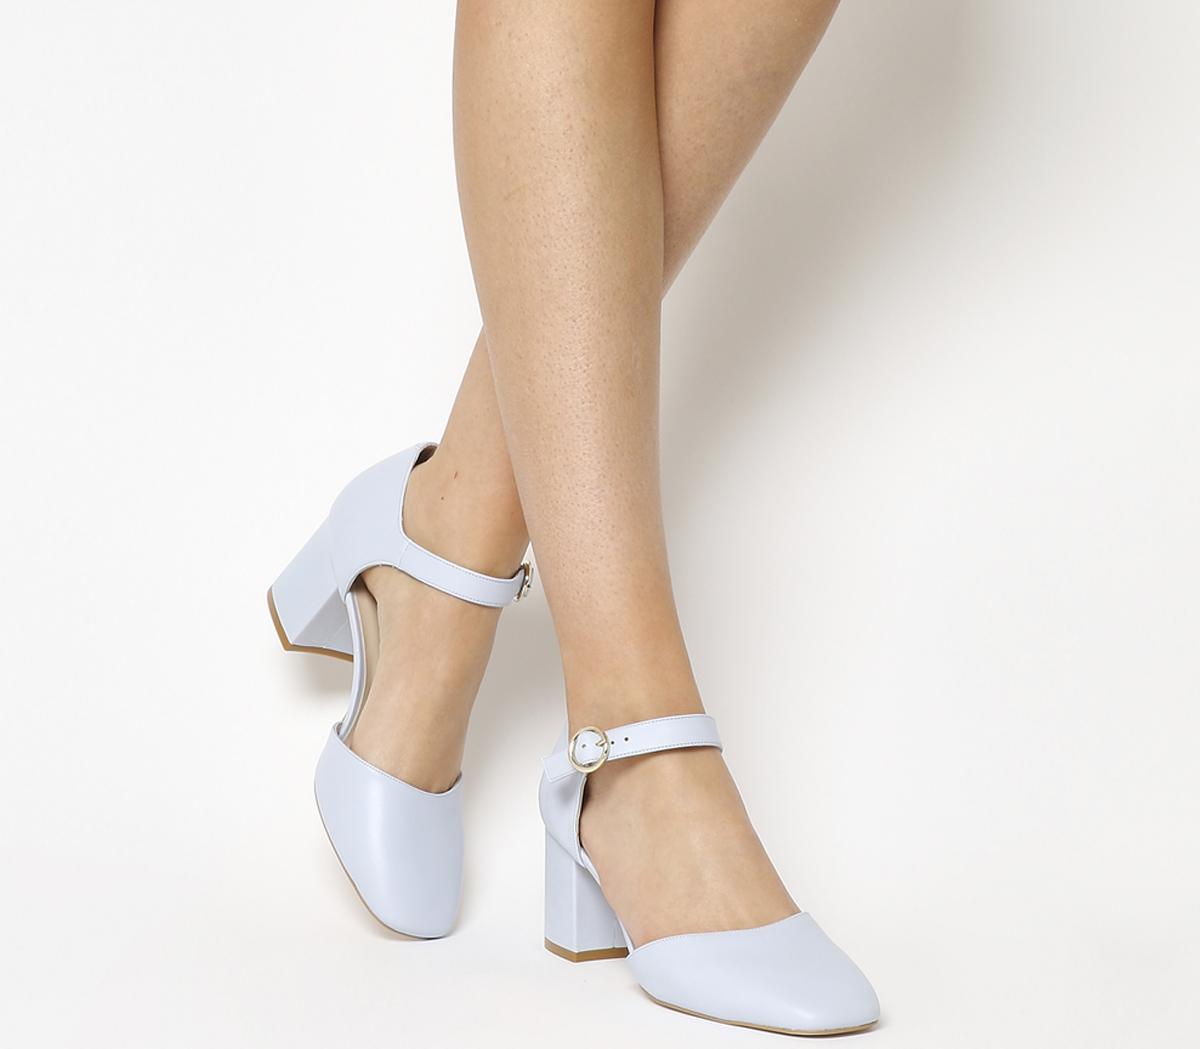 Milkshake Mary Jane Block Heels